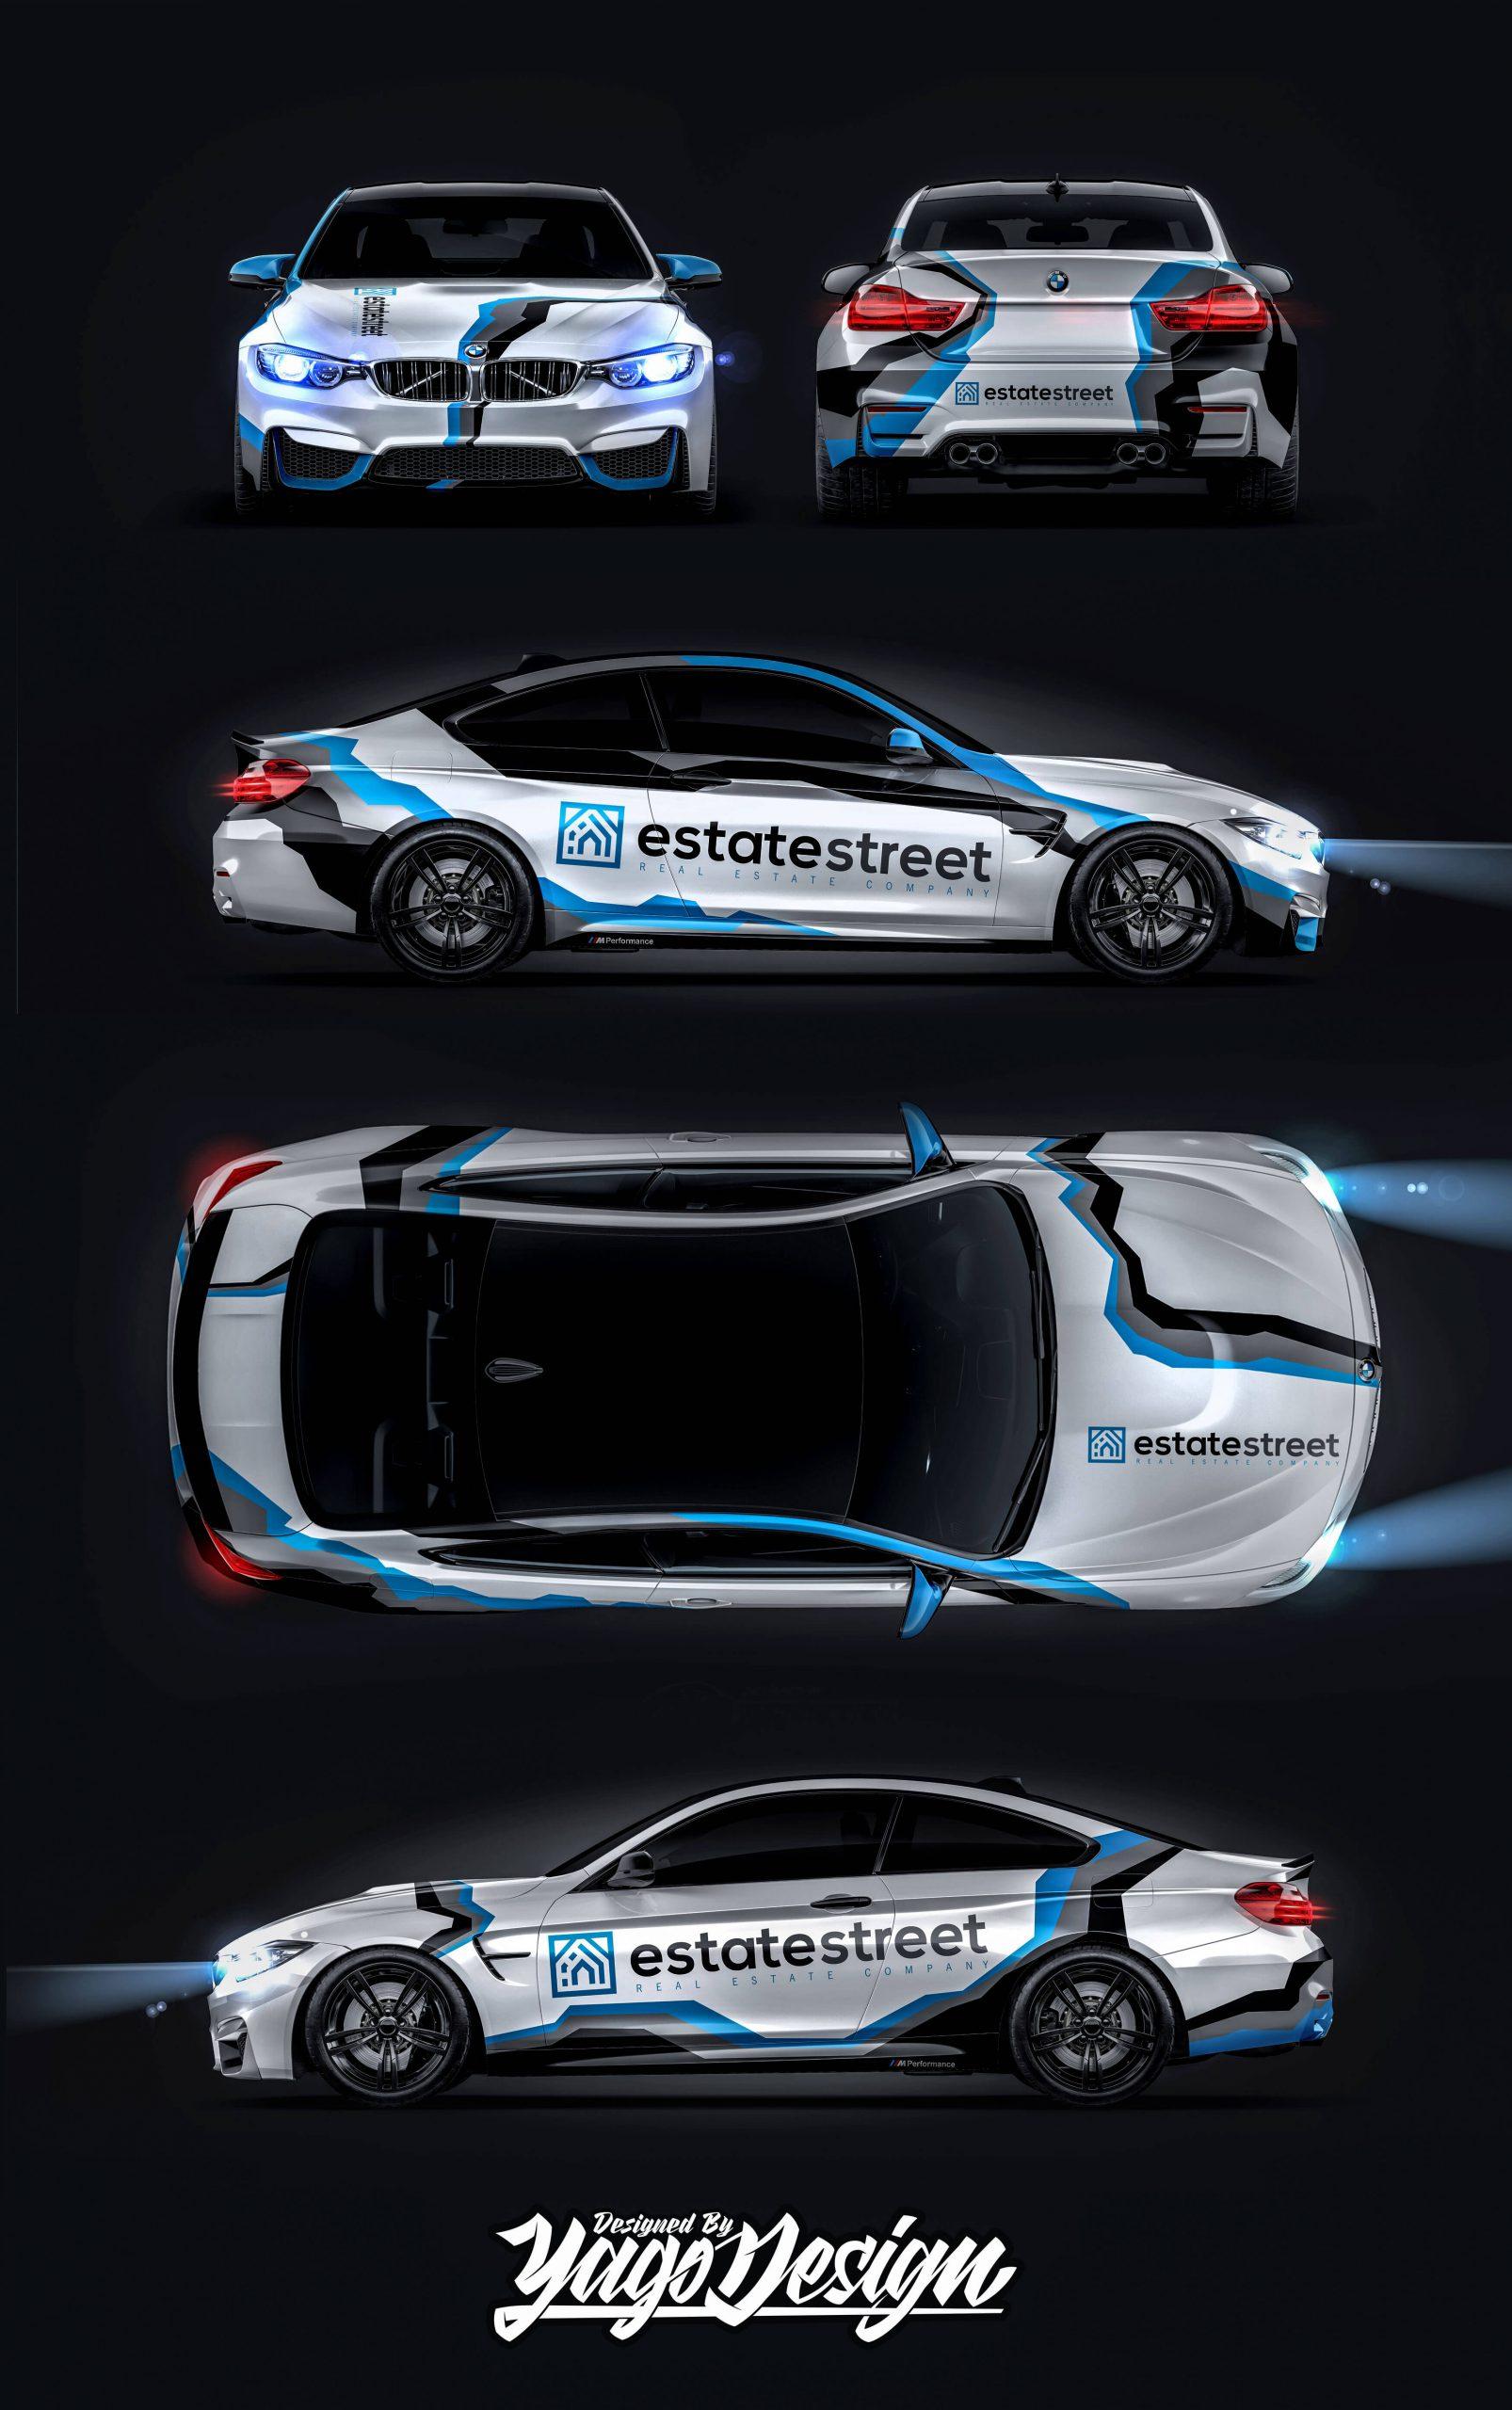 BMW-M4-ESTATESTREET-by-Yagodesign-2019